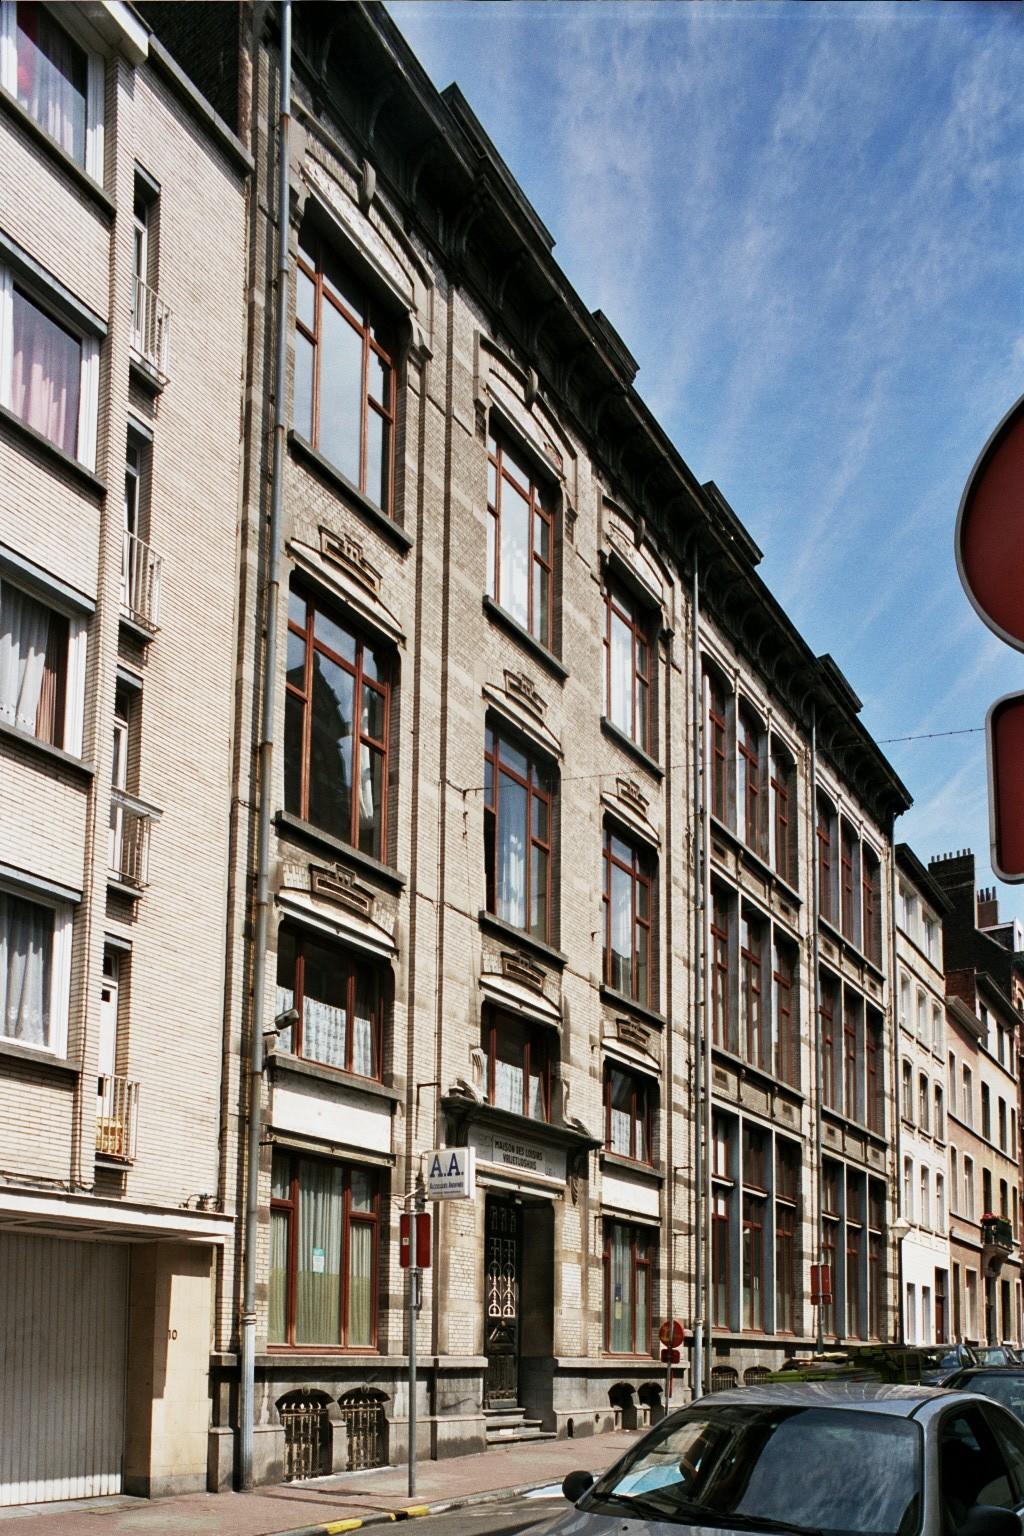 Rue Louis Coenen 12., 2004